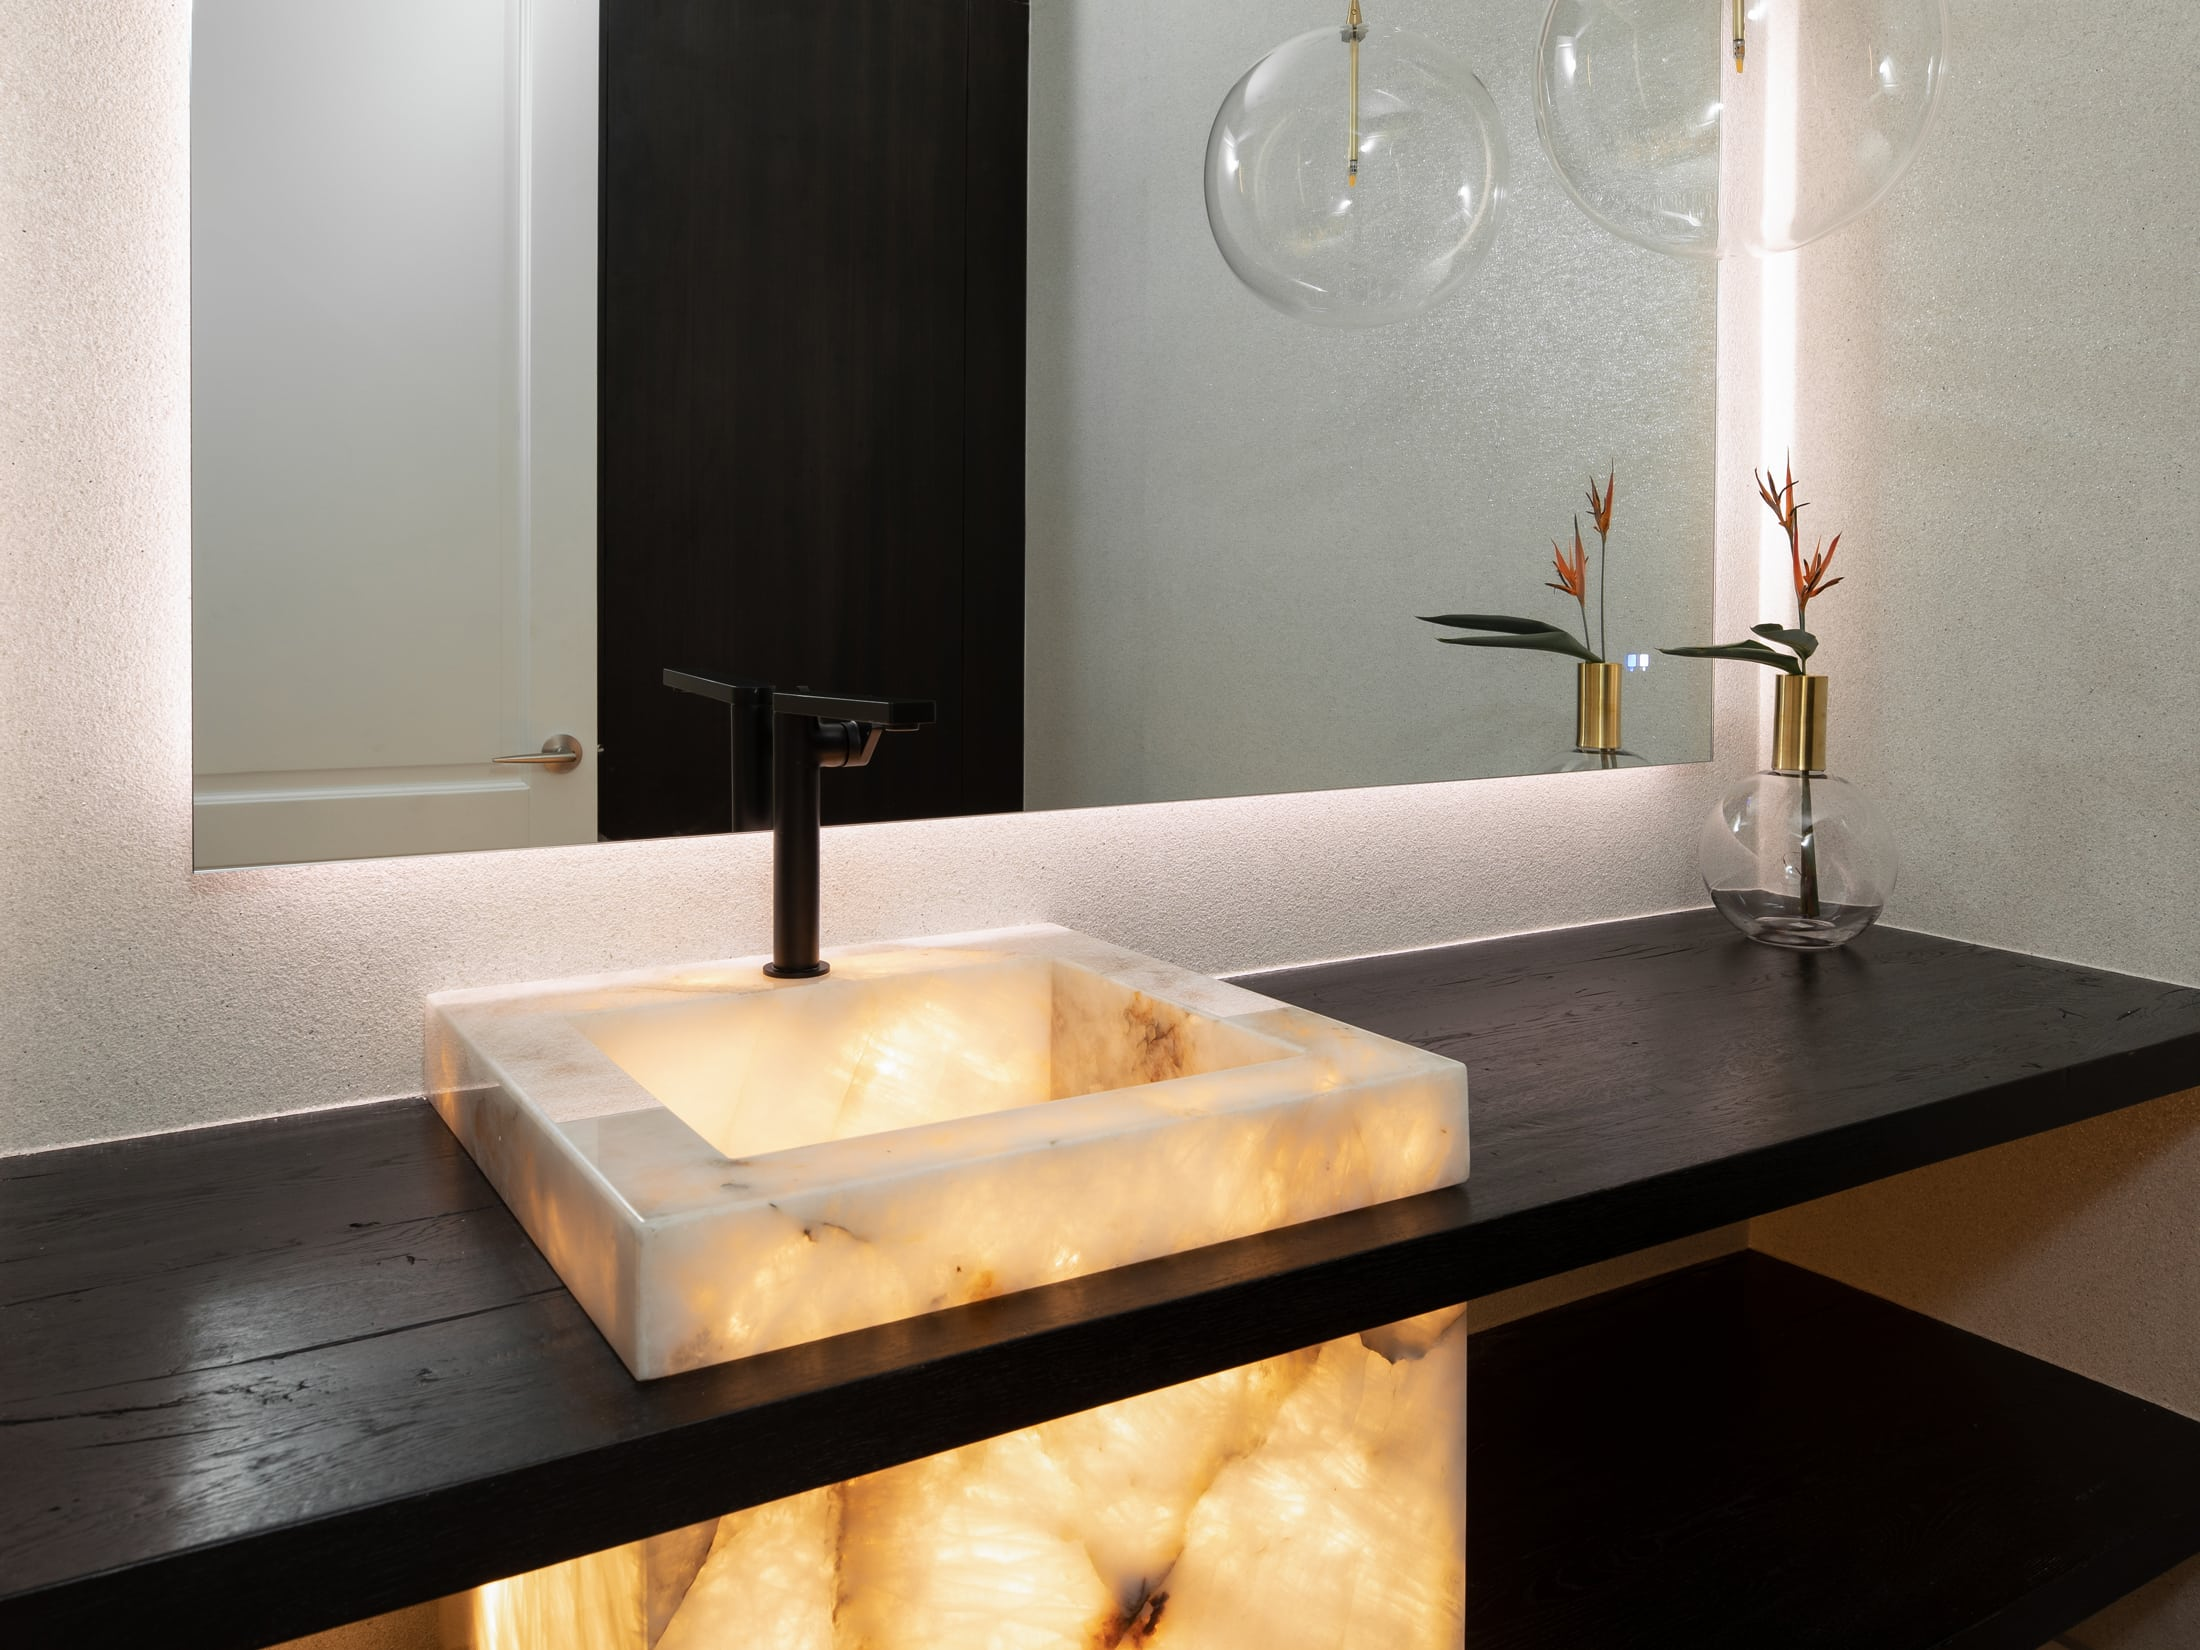 Cristallo Extra Sink Cropped 1, Primestones® Granite, Quartz, Marble